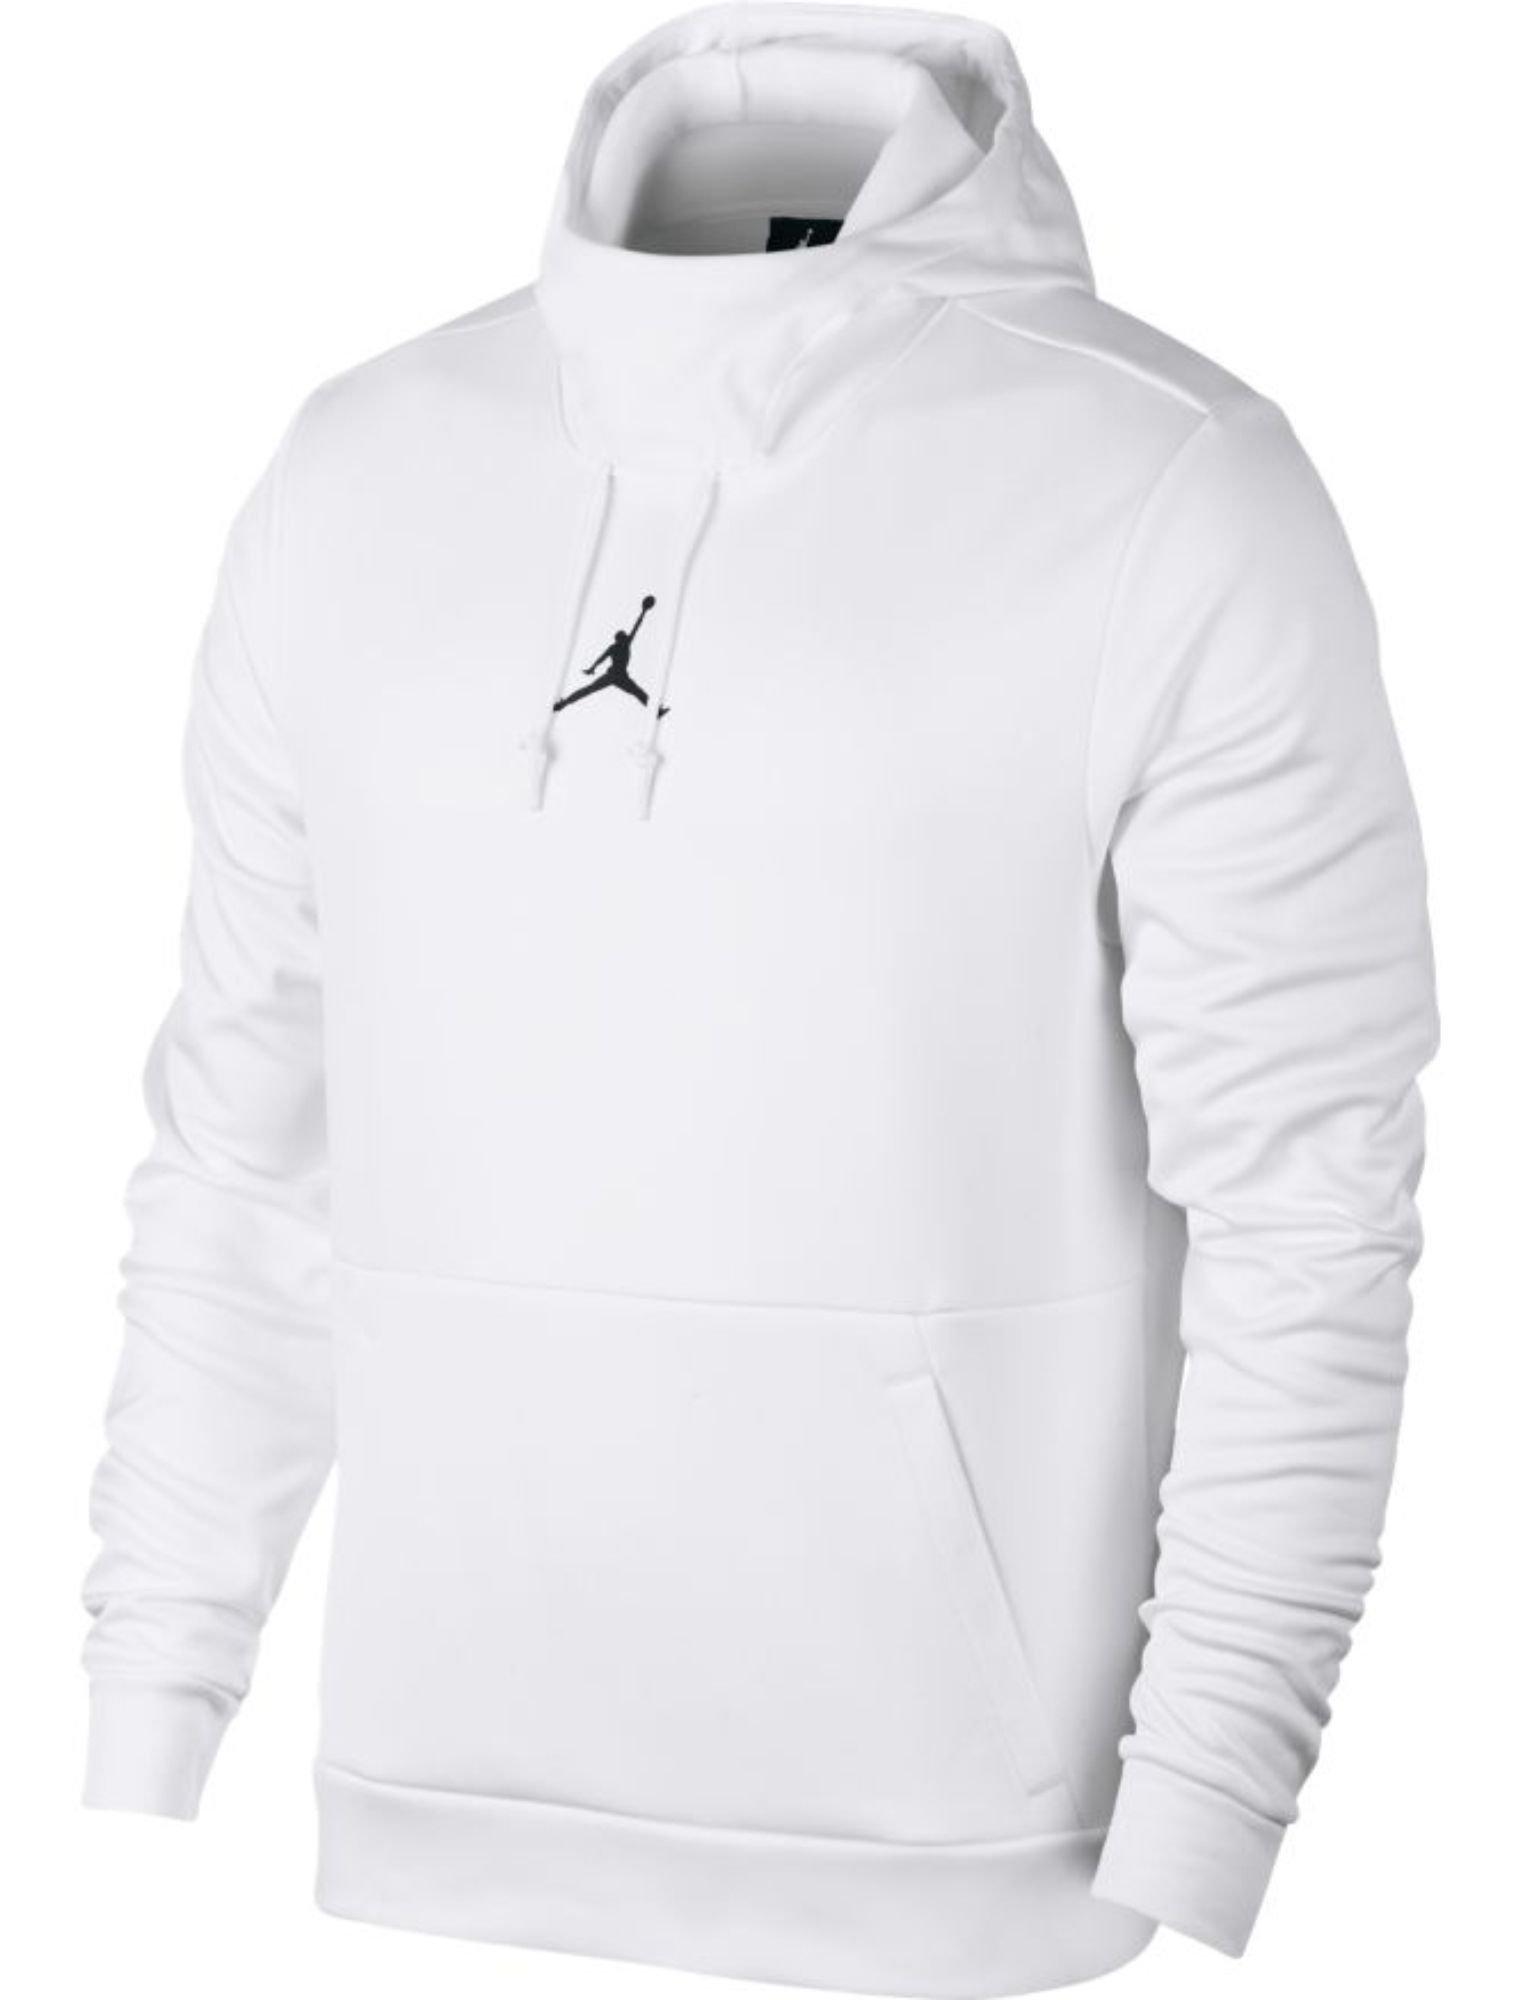 Jordan Men's Therma 23 Alpha Training Pullover Hoodie - White/Black - 861559-100 - SZ. X-Small